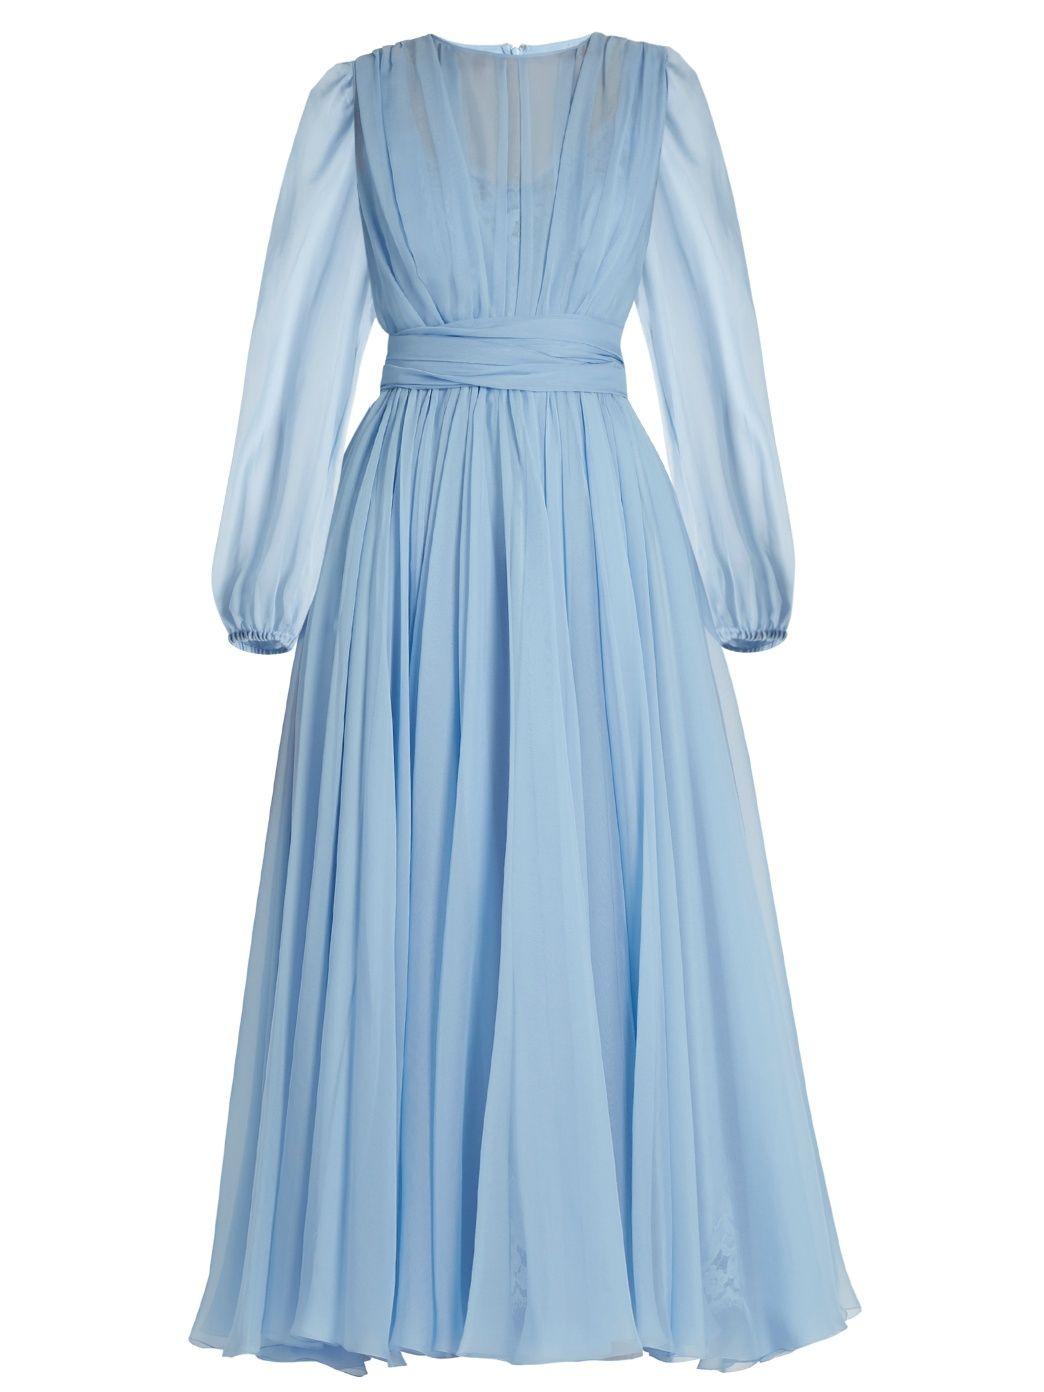 Buy Silk blue chiffon dress picture trends